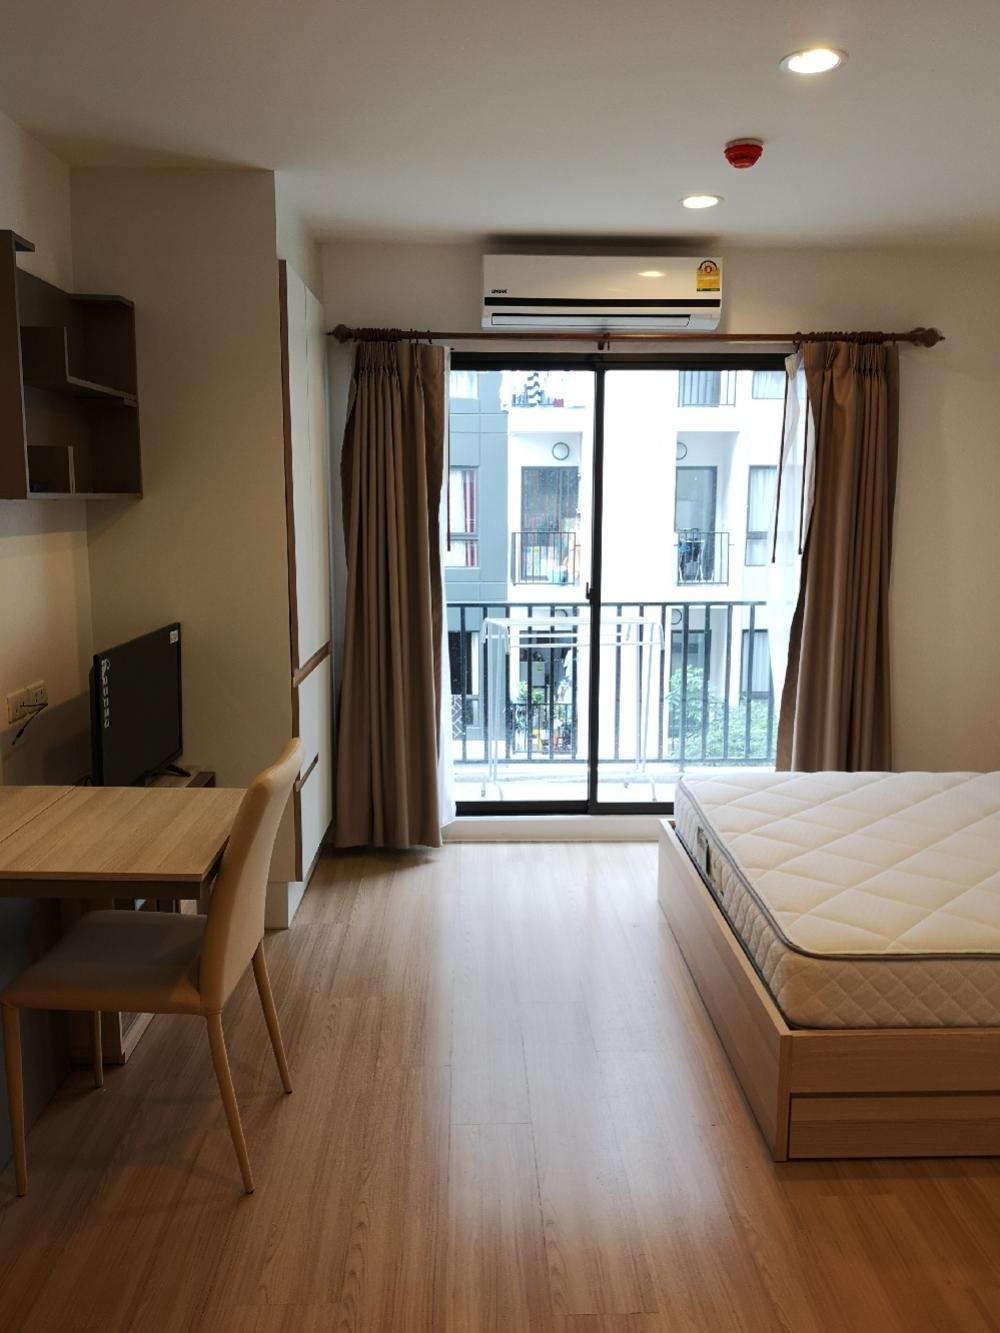 For RentCondoSukhumvit, Asoke, Thonglor : For rent, The Nest Sukhumvit22. Studio room 22 sqm. 4th floor, Building A